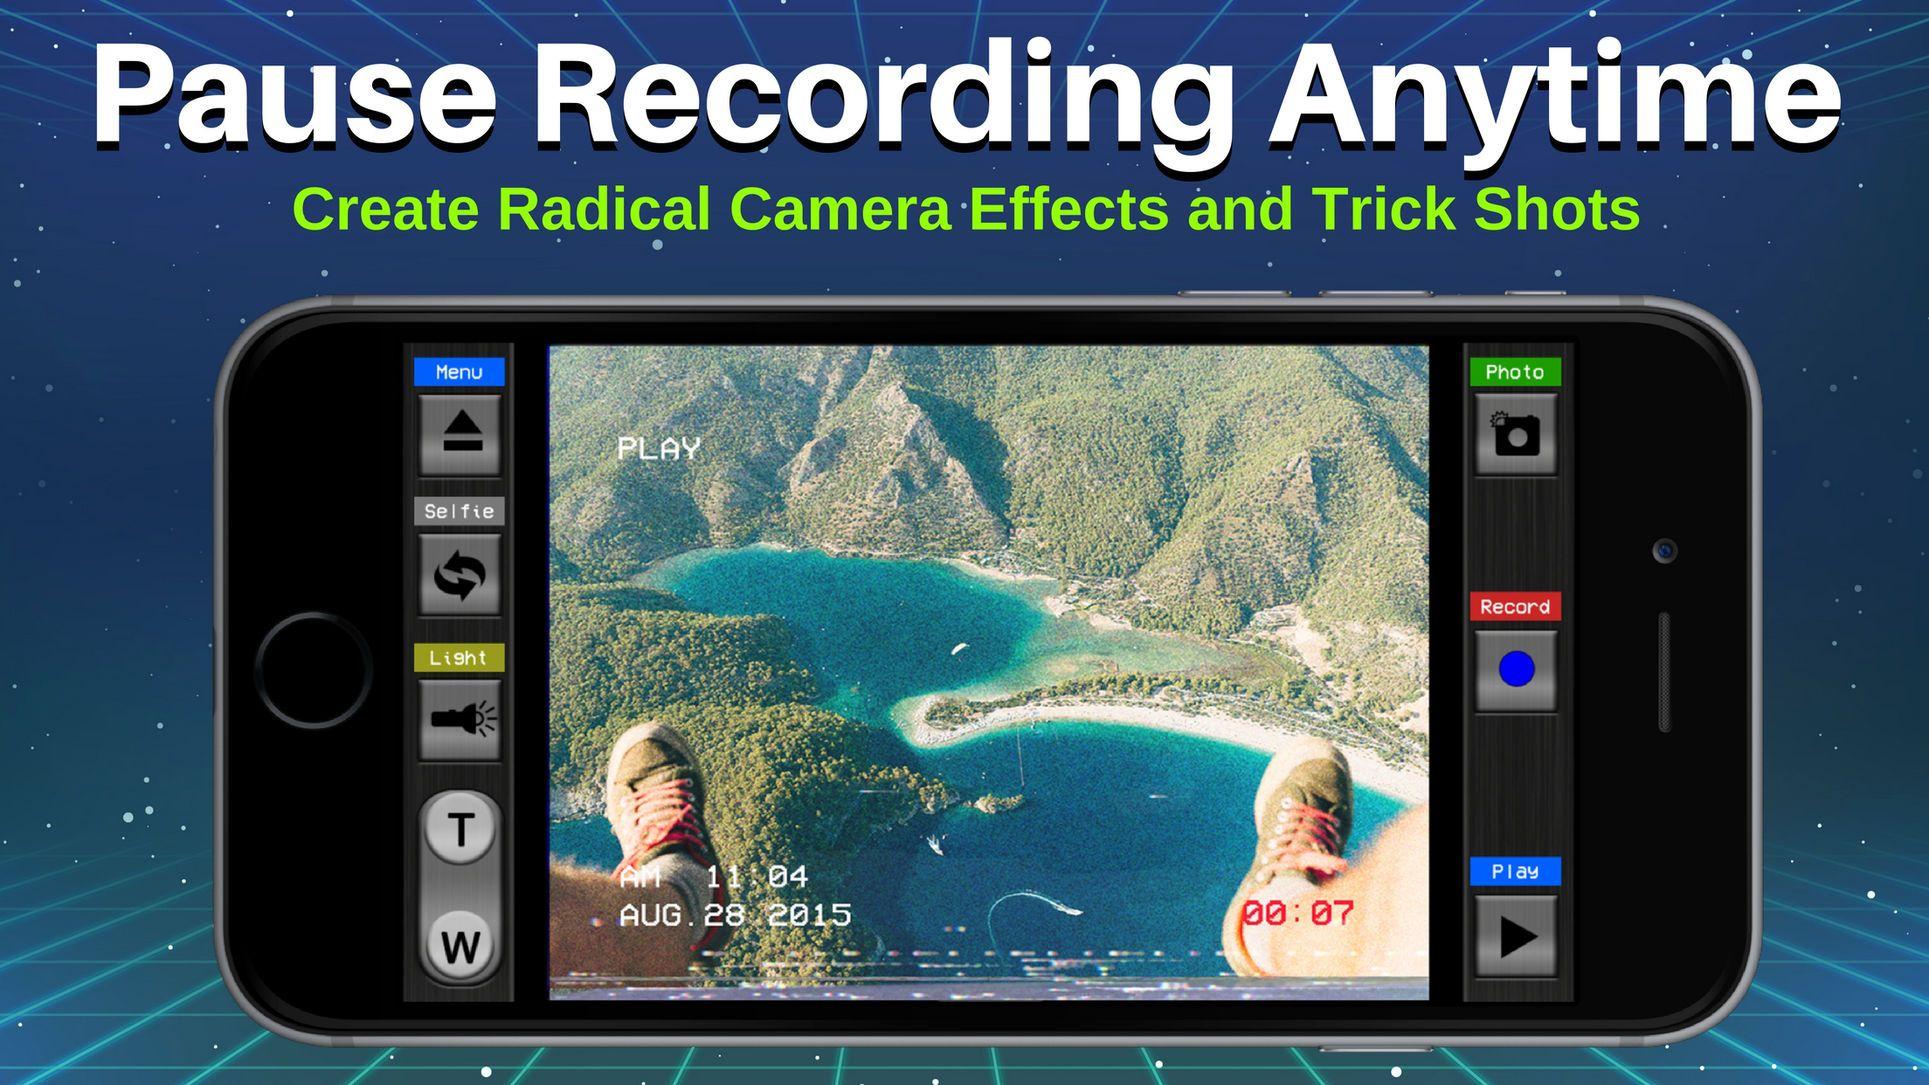 Retro Vhs Old School Video Camcorder School Videos Camcorder Vhs